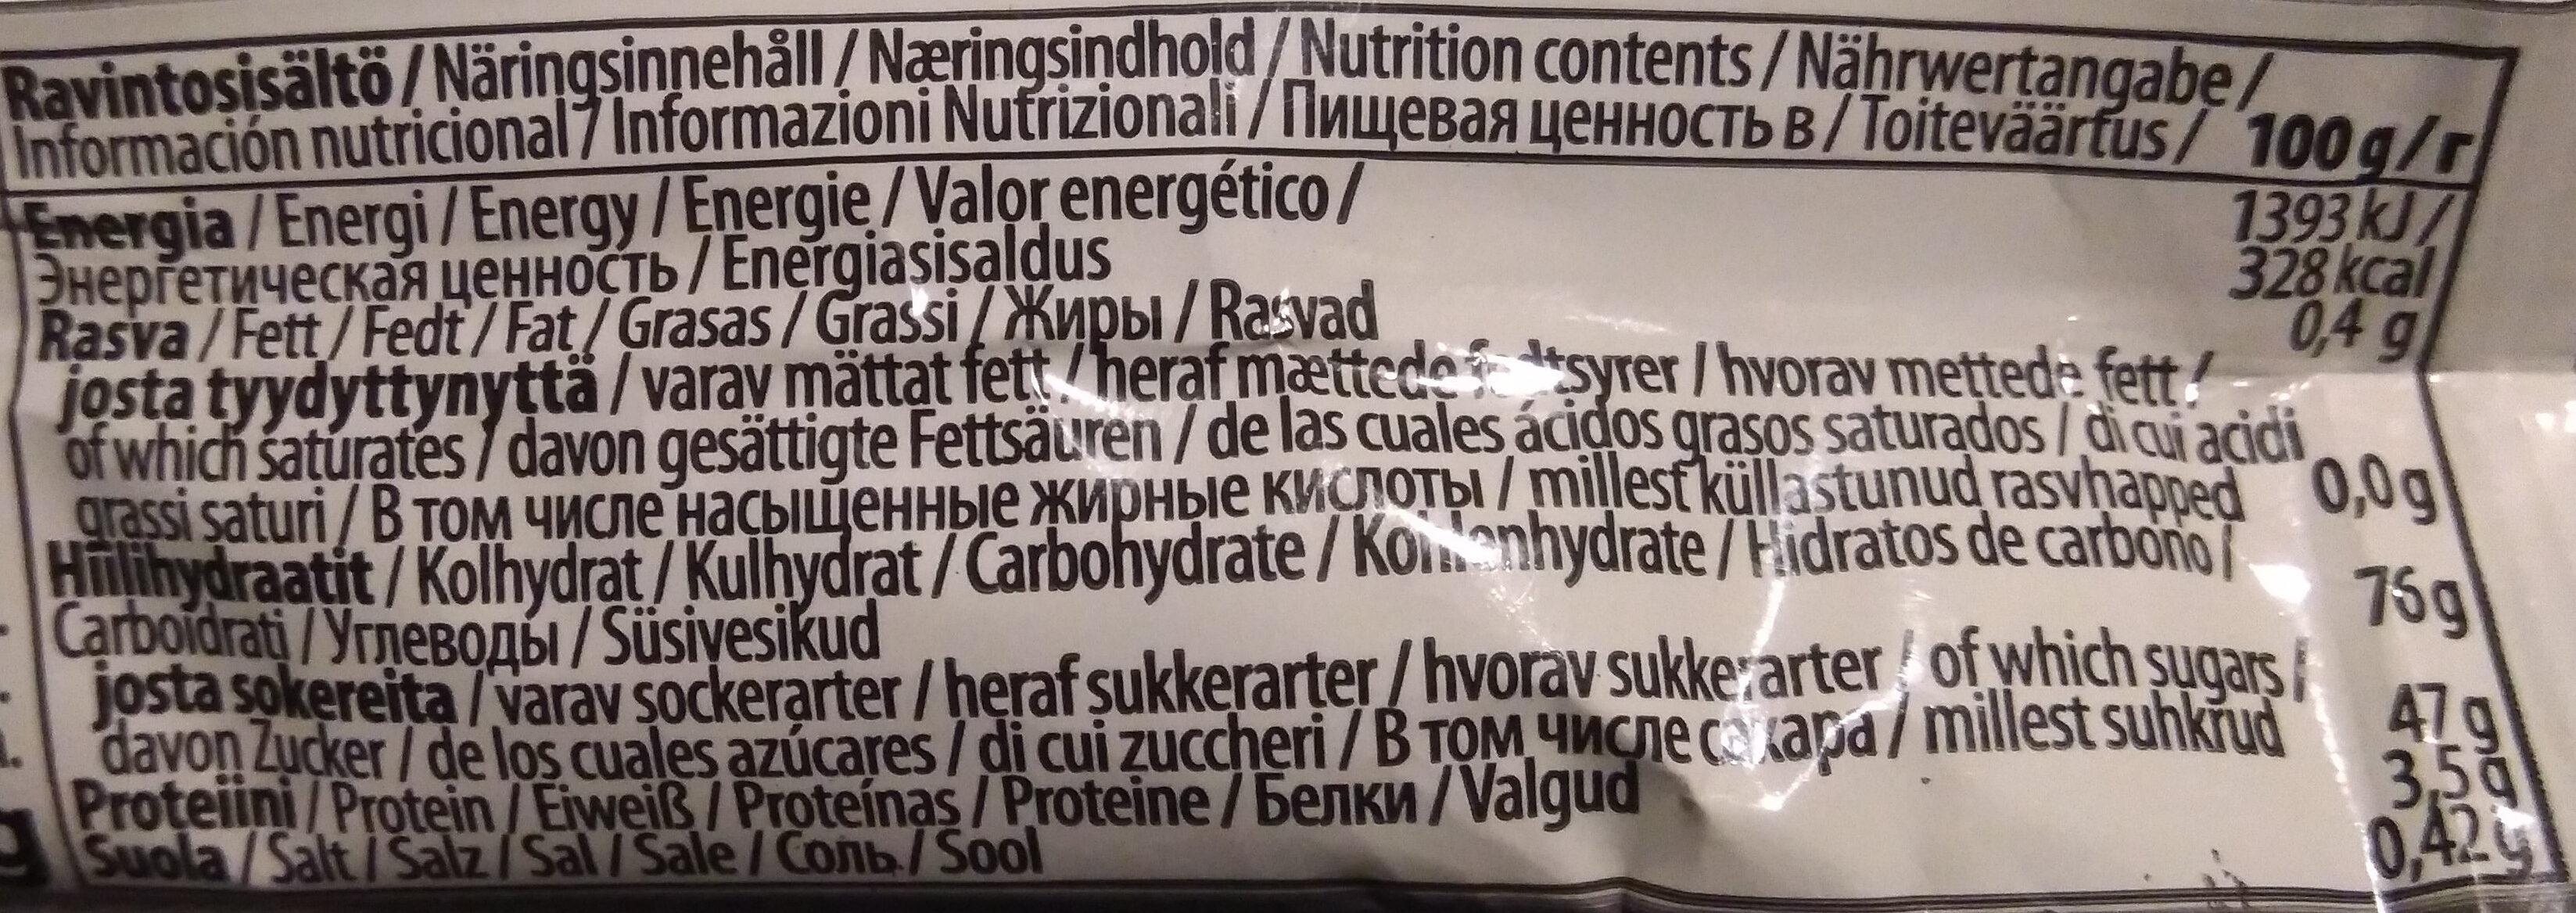 Pepe original xxl - Nutrition facts